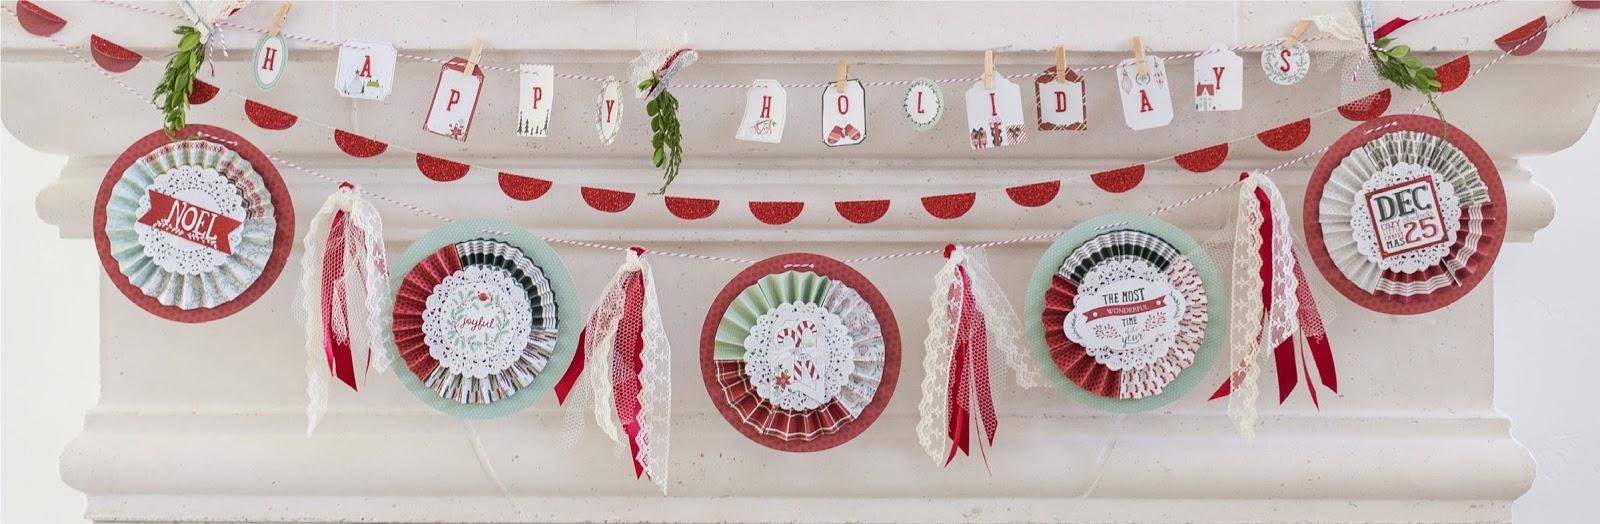 The Blog: My Mind39;s Eye Christmas on Market Street and Cozy Christmas